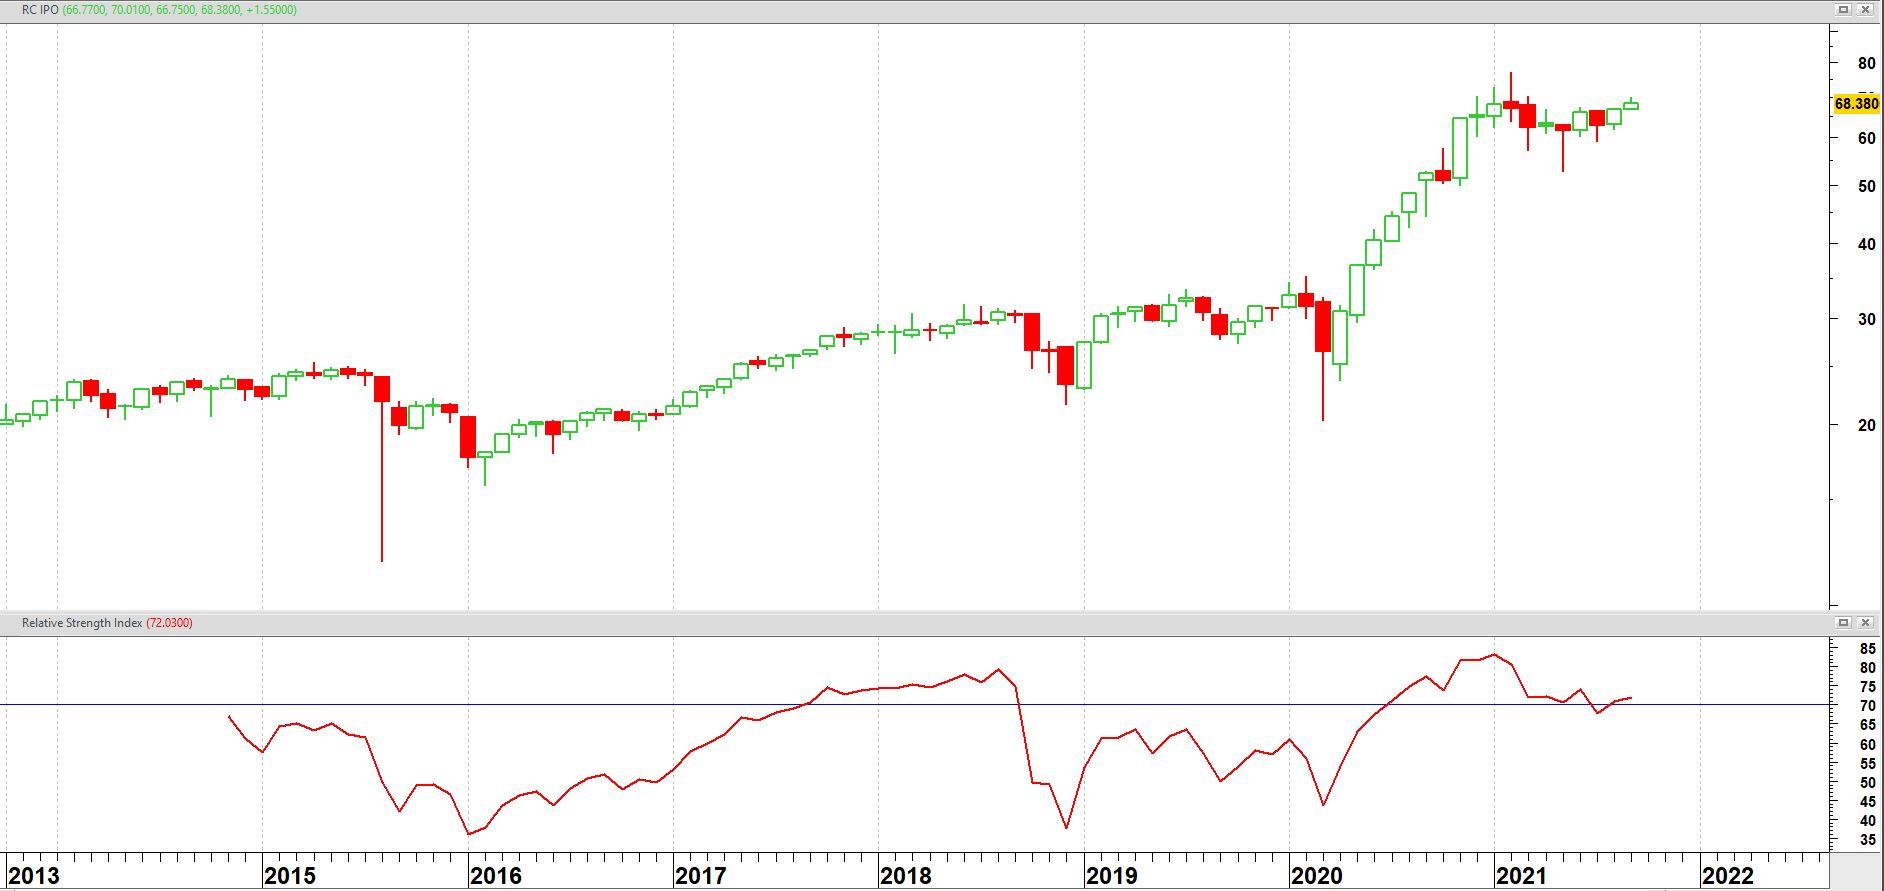 Renaissance IPO ETF op maandbasis